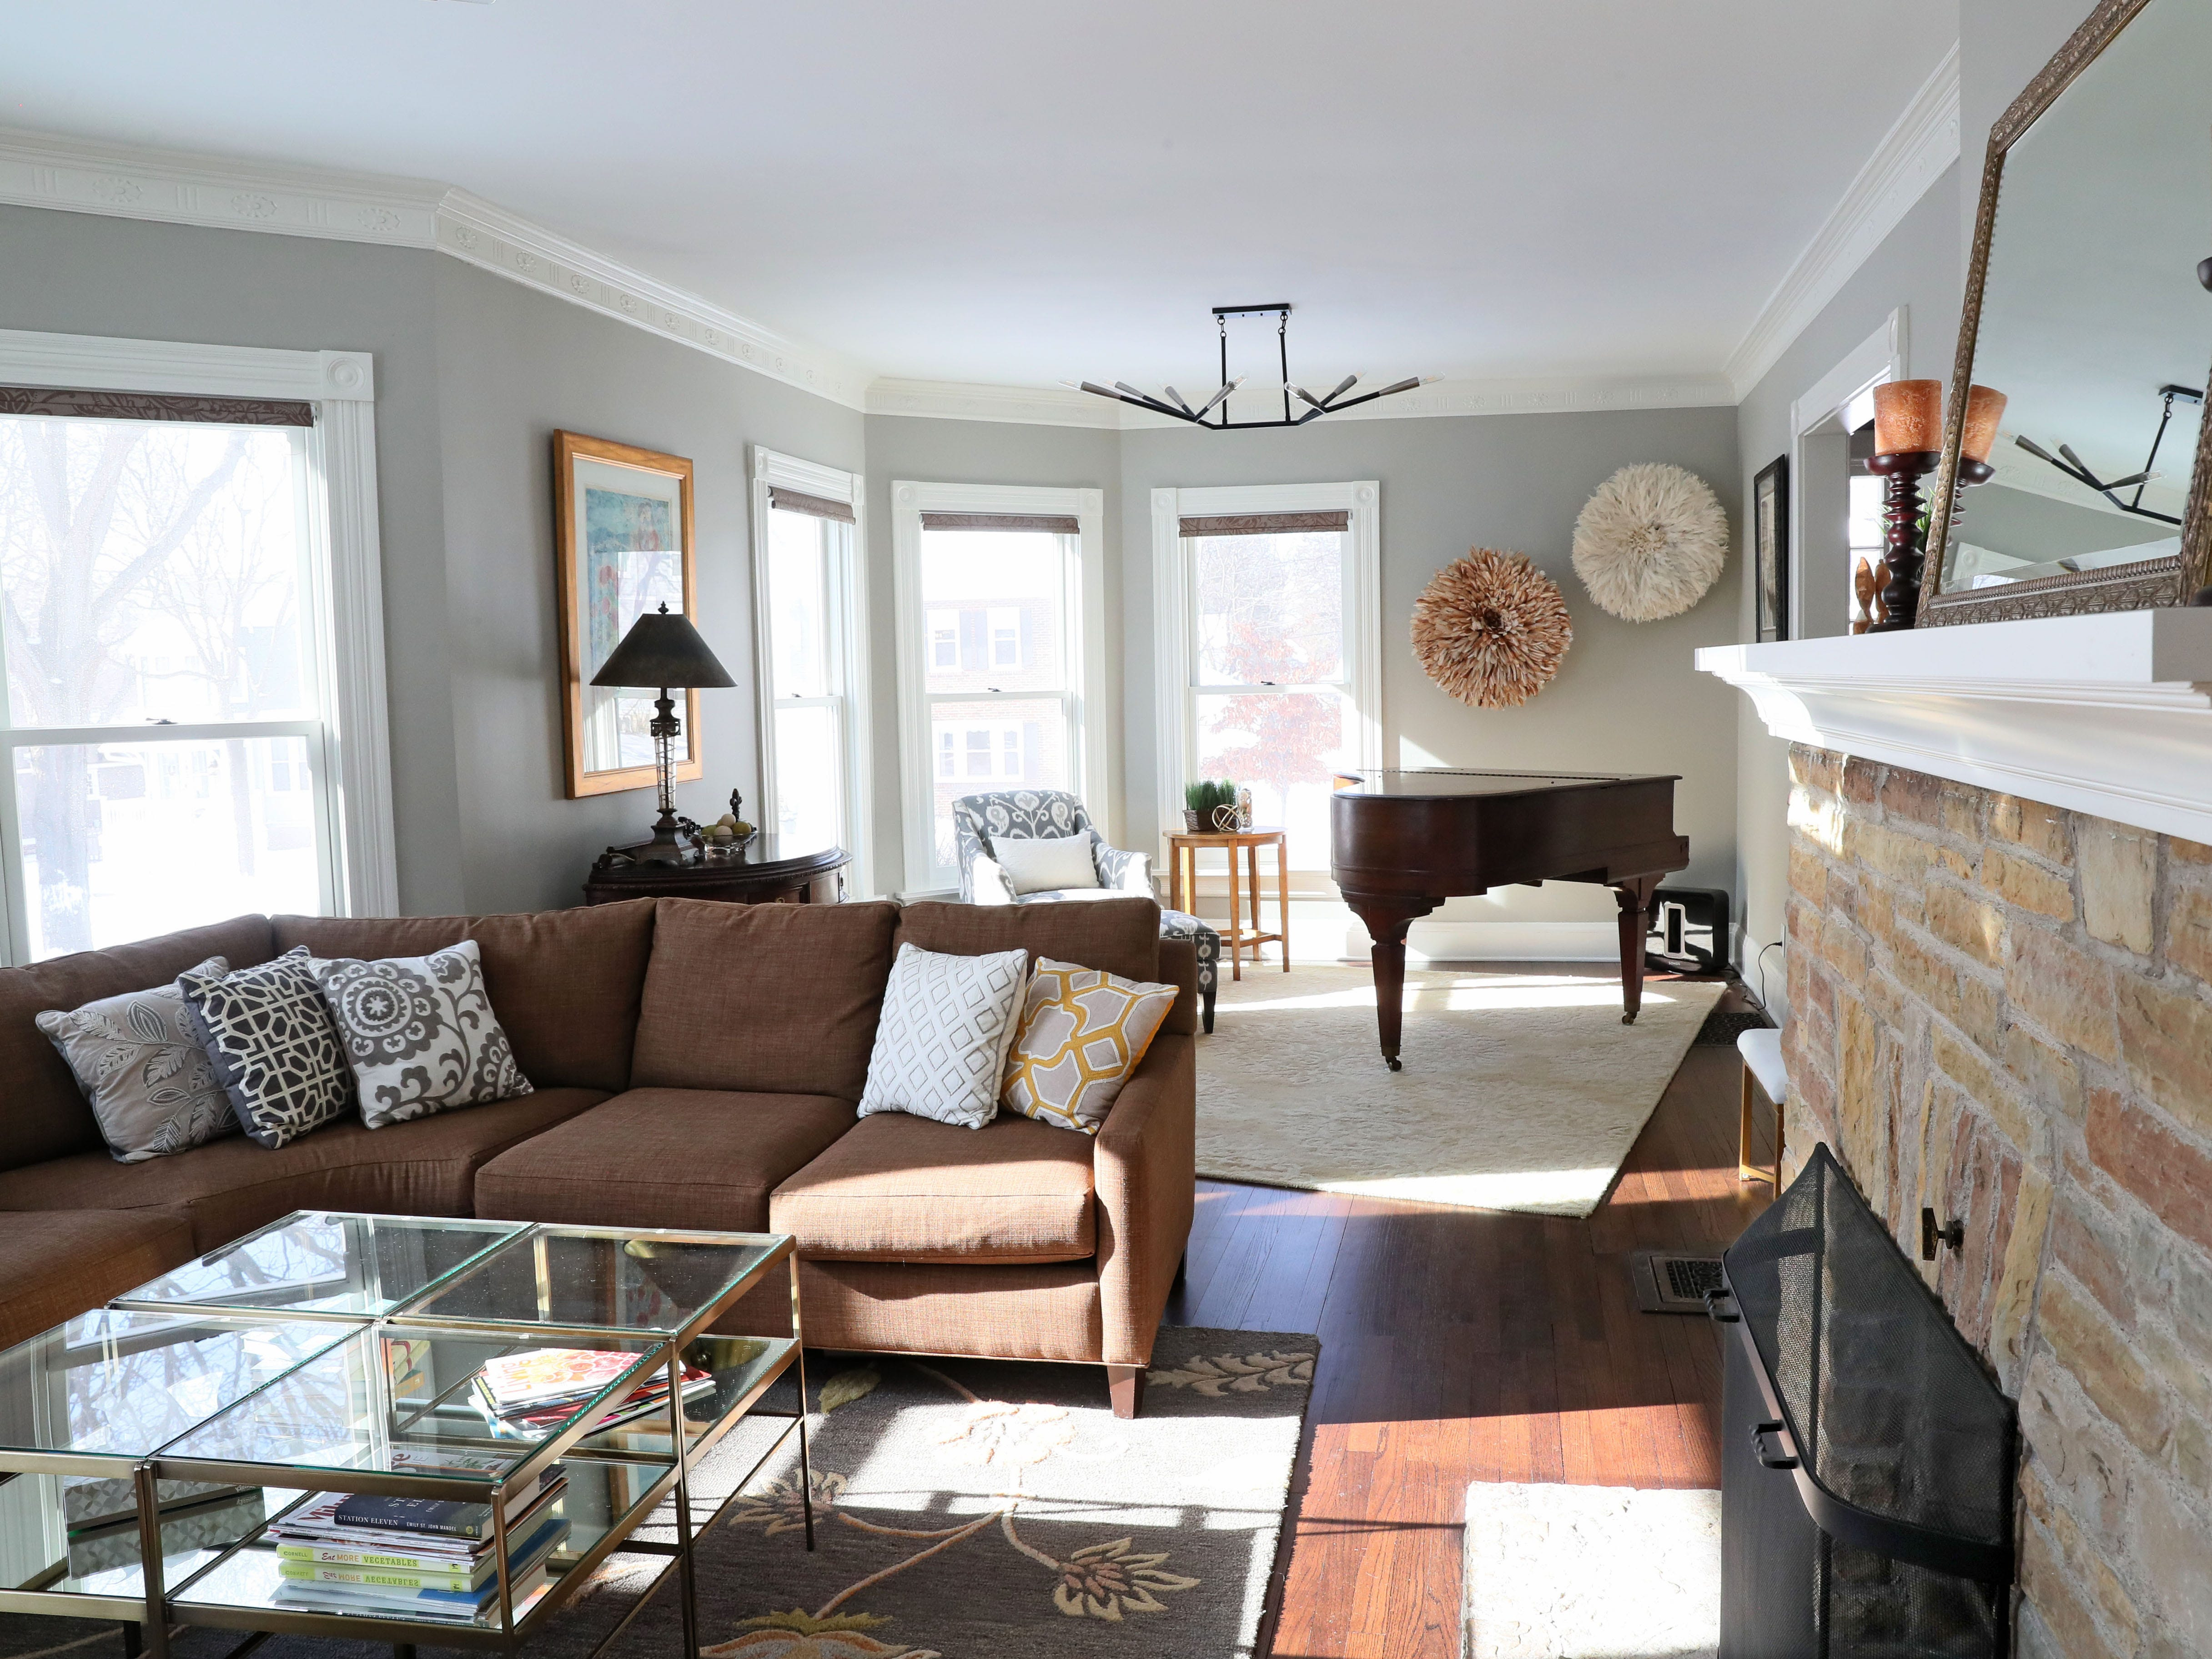 Original oak flooring was kept in the living room.